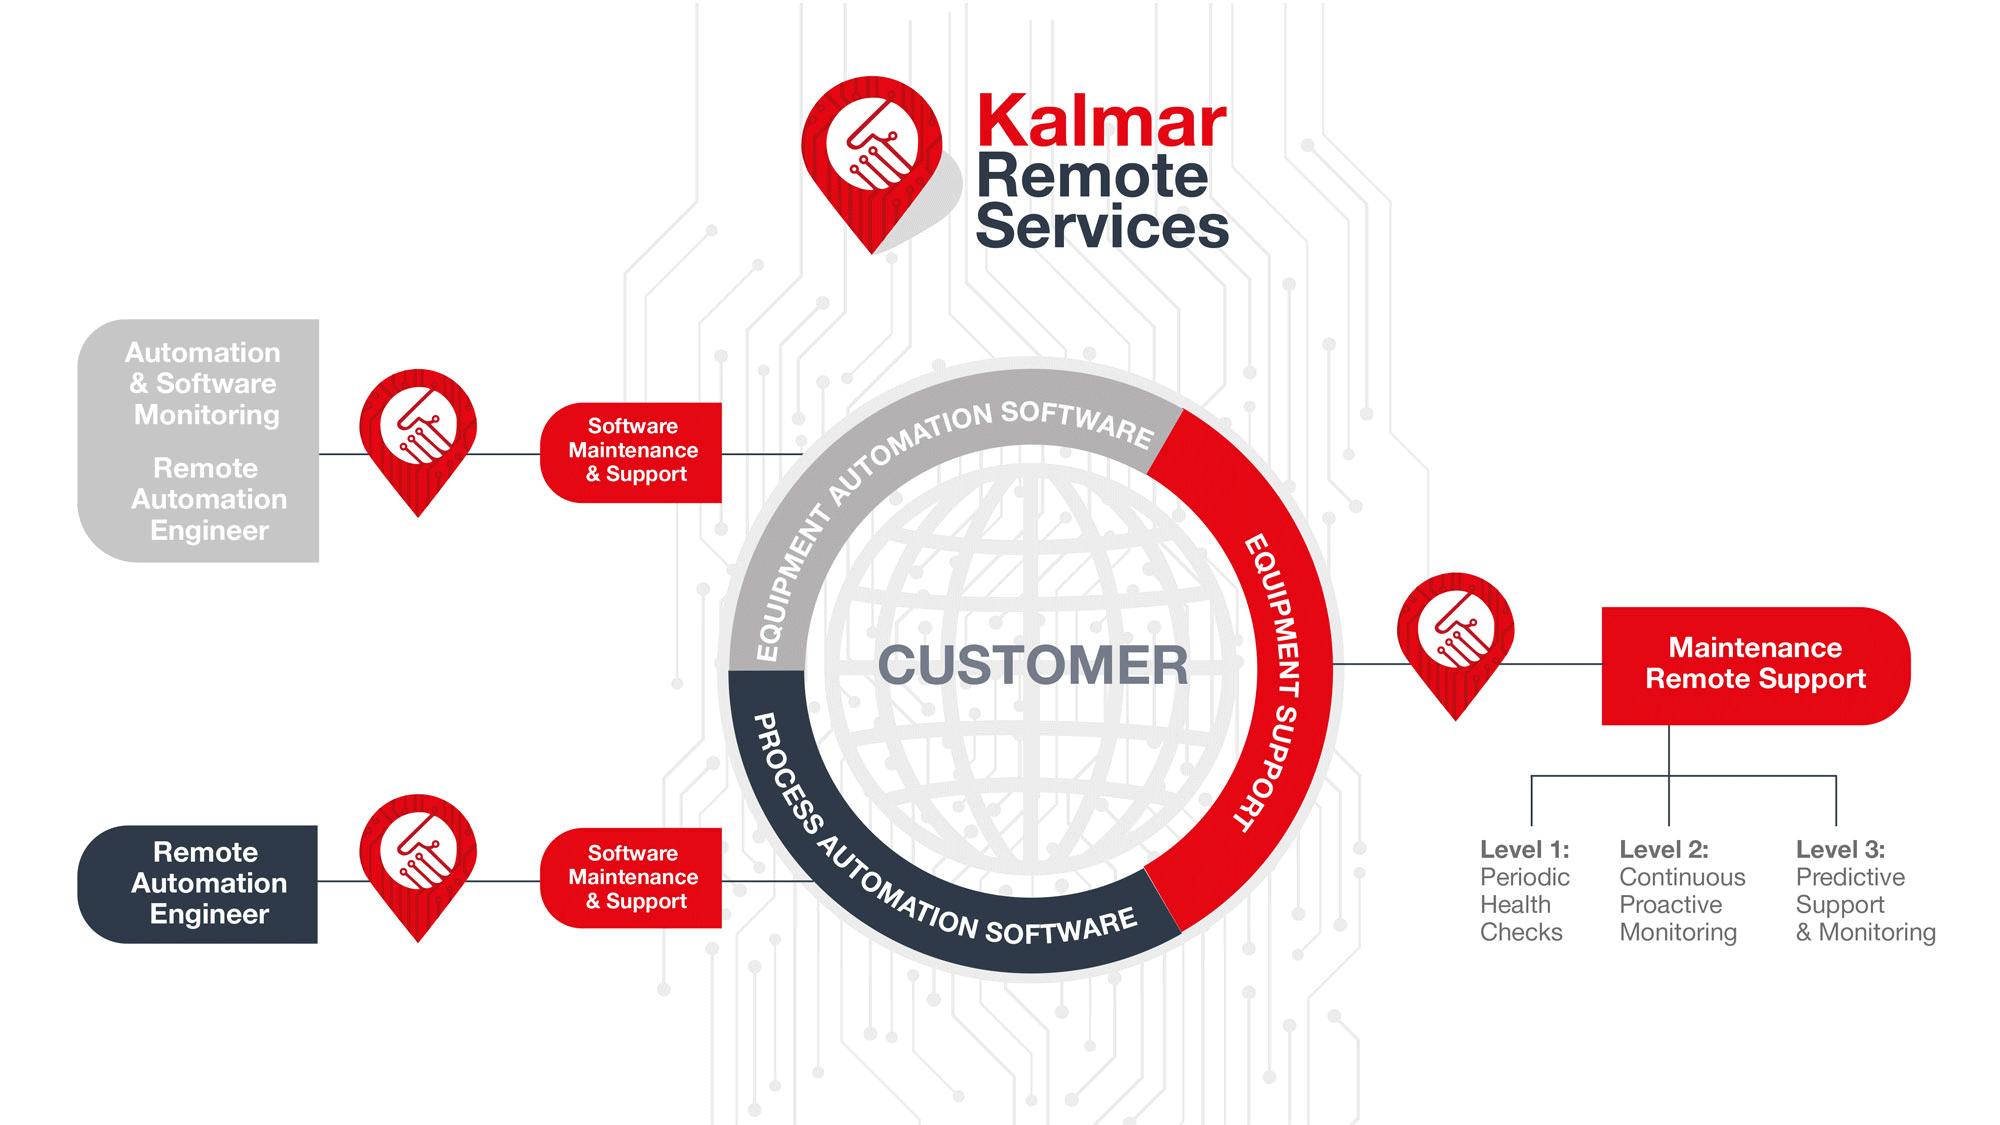 kalmar-krs-infographic-2000px